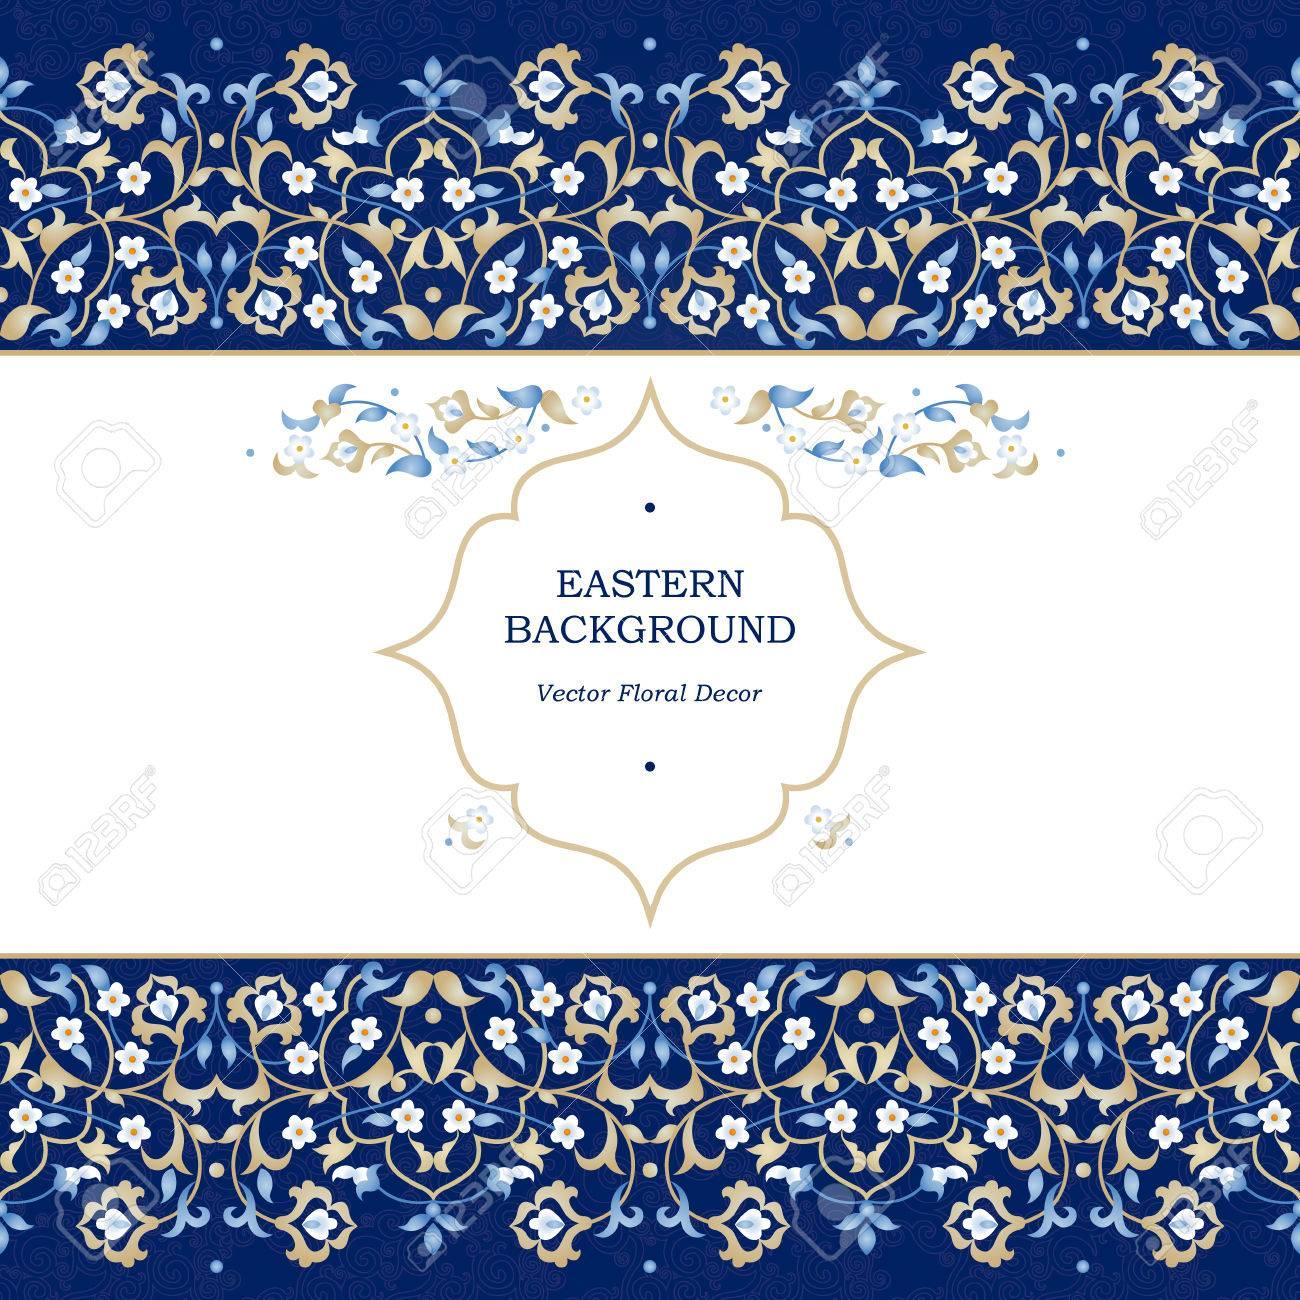 Vector Seamless Border In Eastern Style On Dark Blue Background